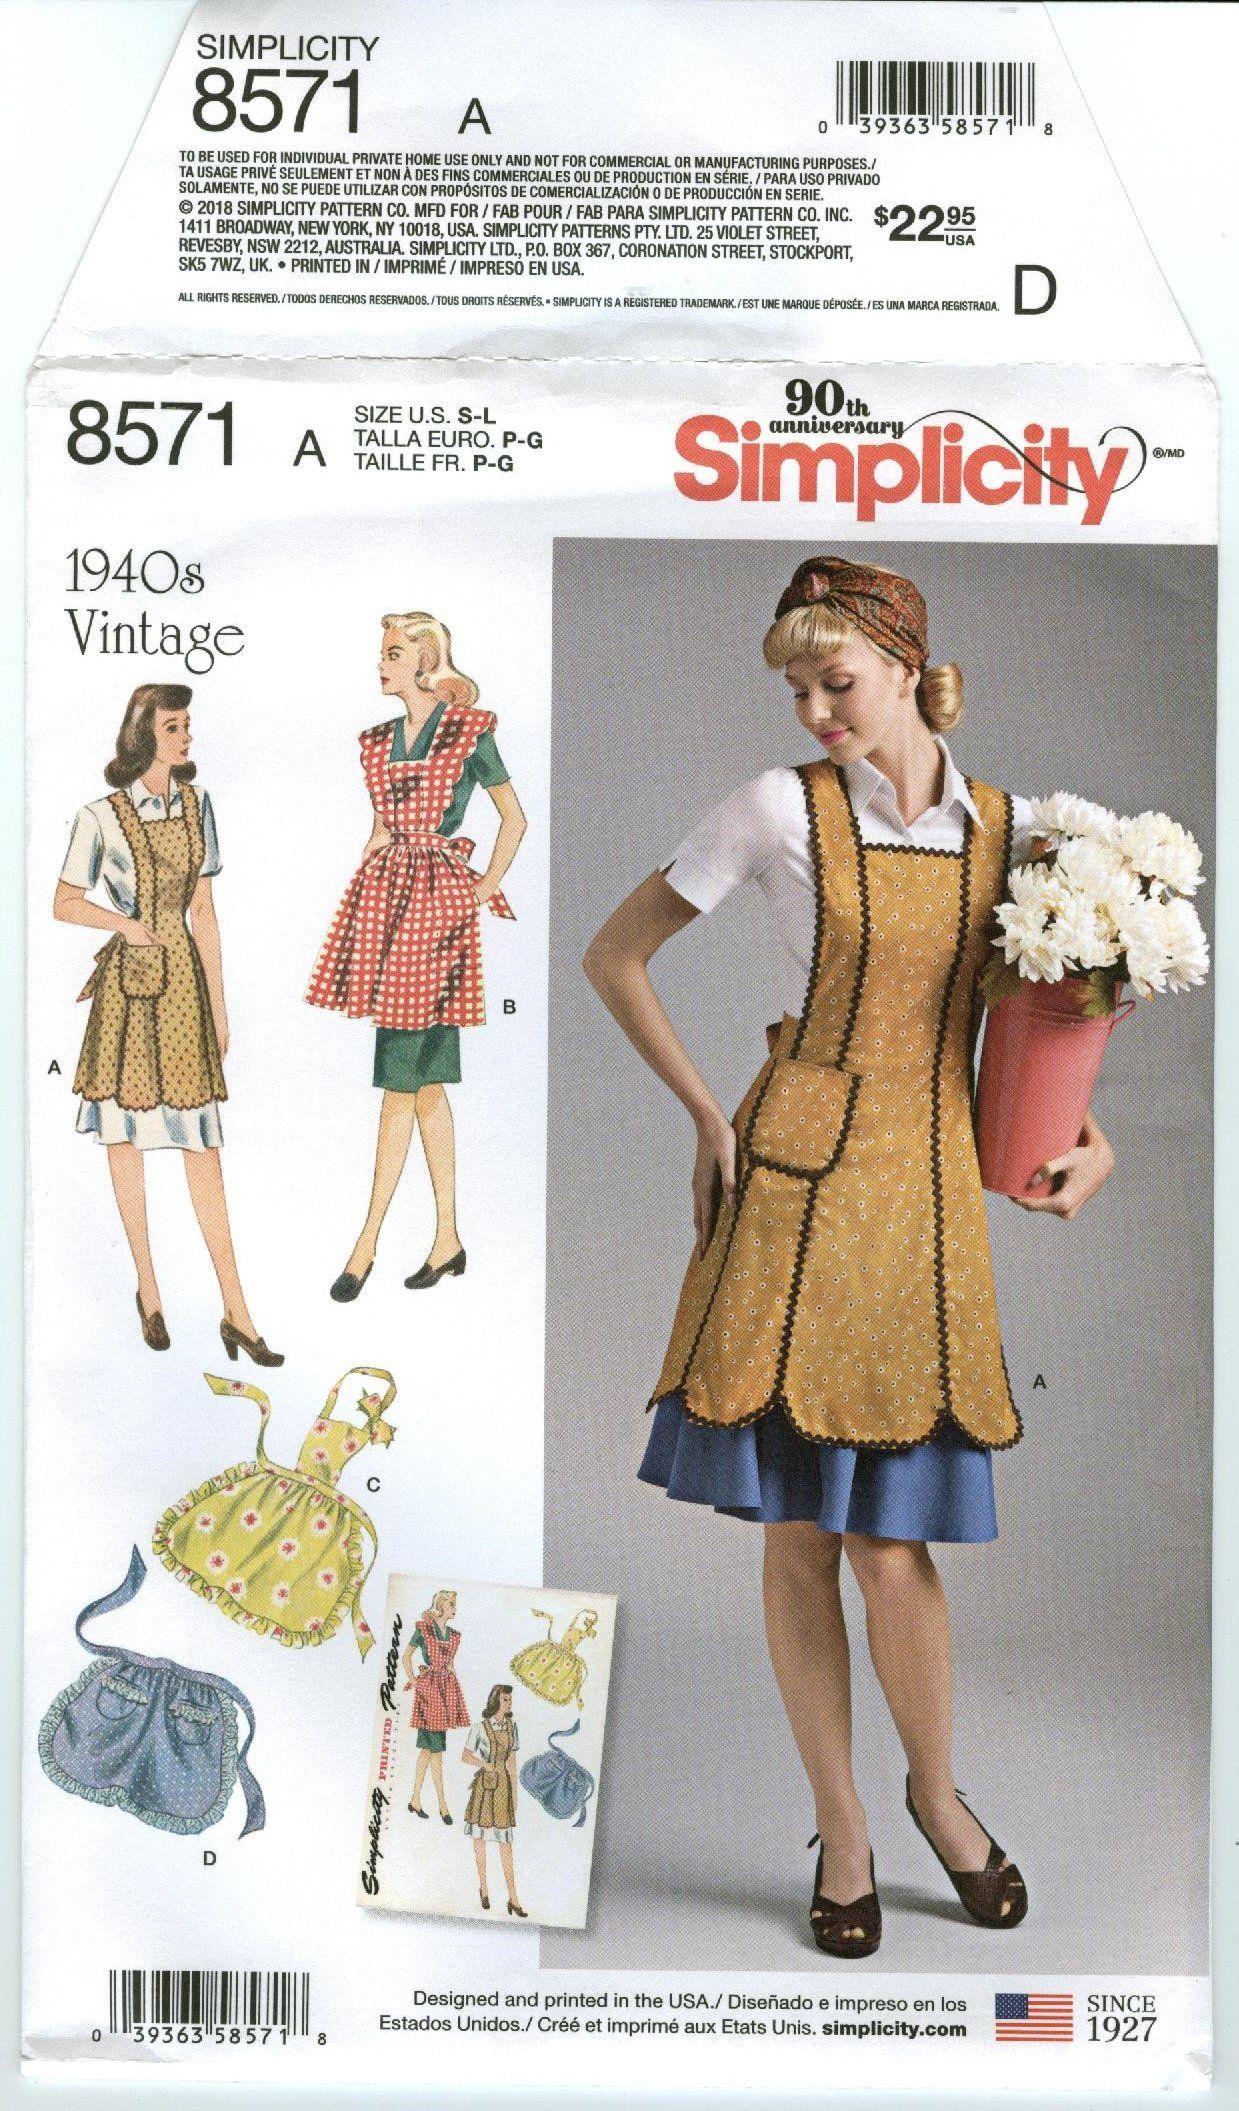 *NEW APRONS Simplicity Retro Sewing Pattern S-M-L UNCUT